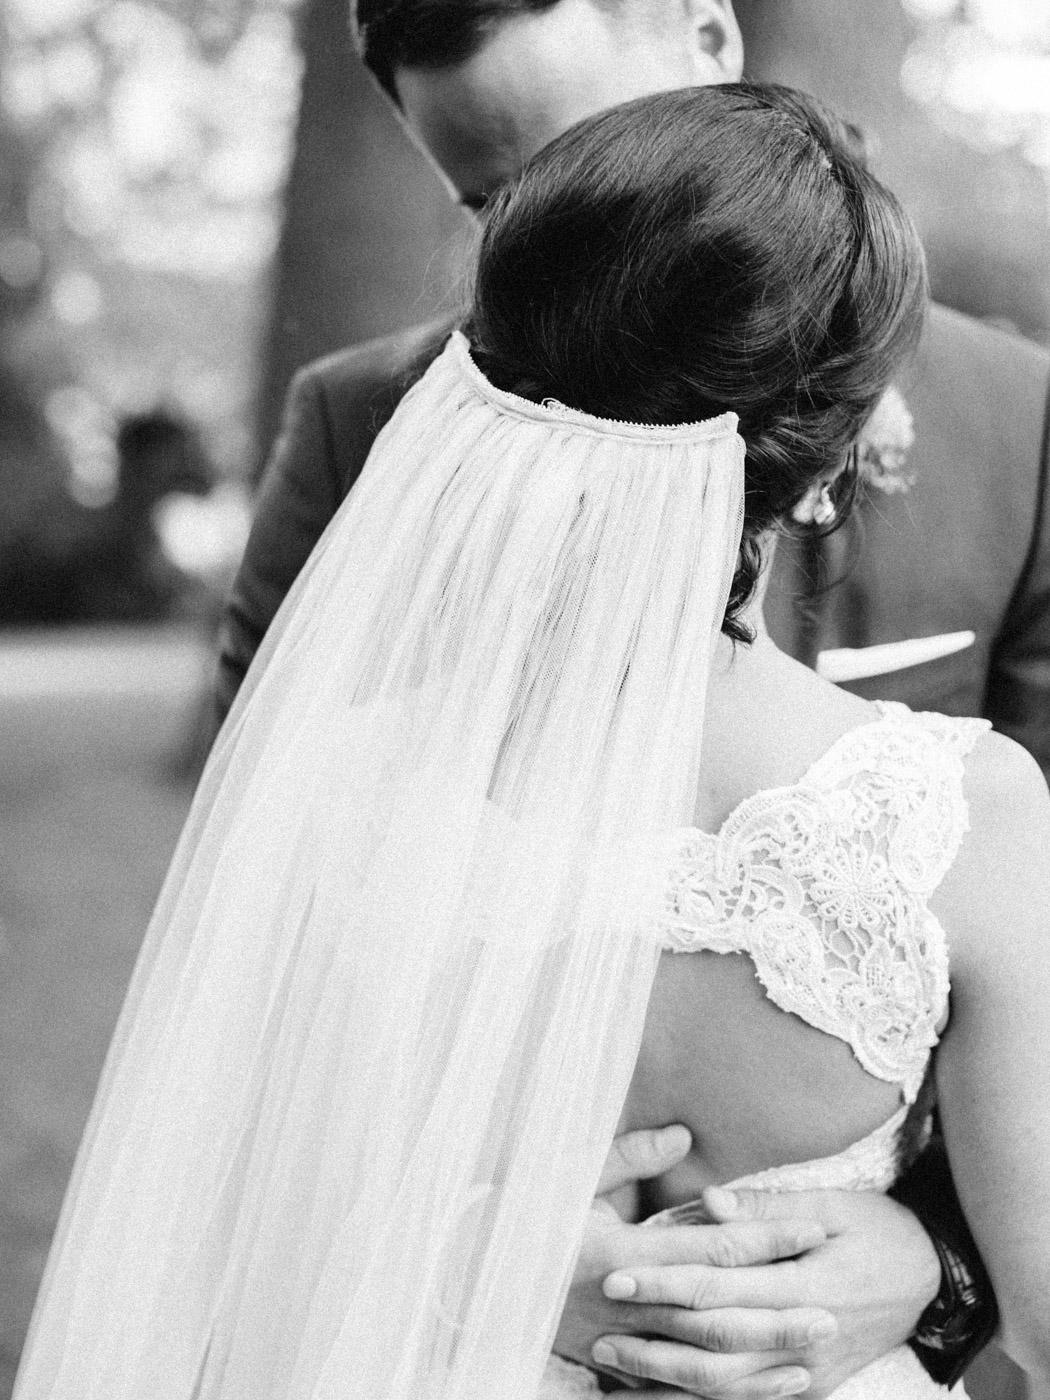 toronto_wedding_photographer_fine_art_documentary-265.jpg